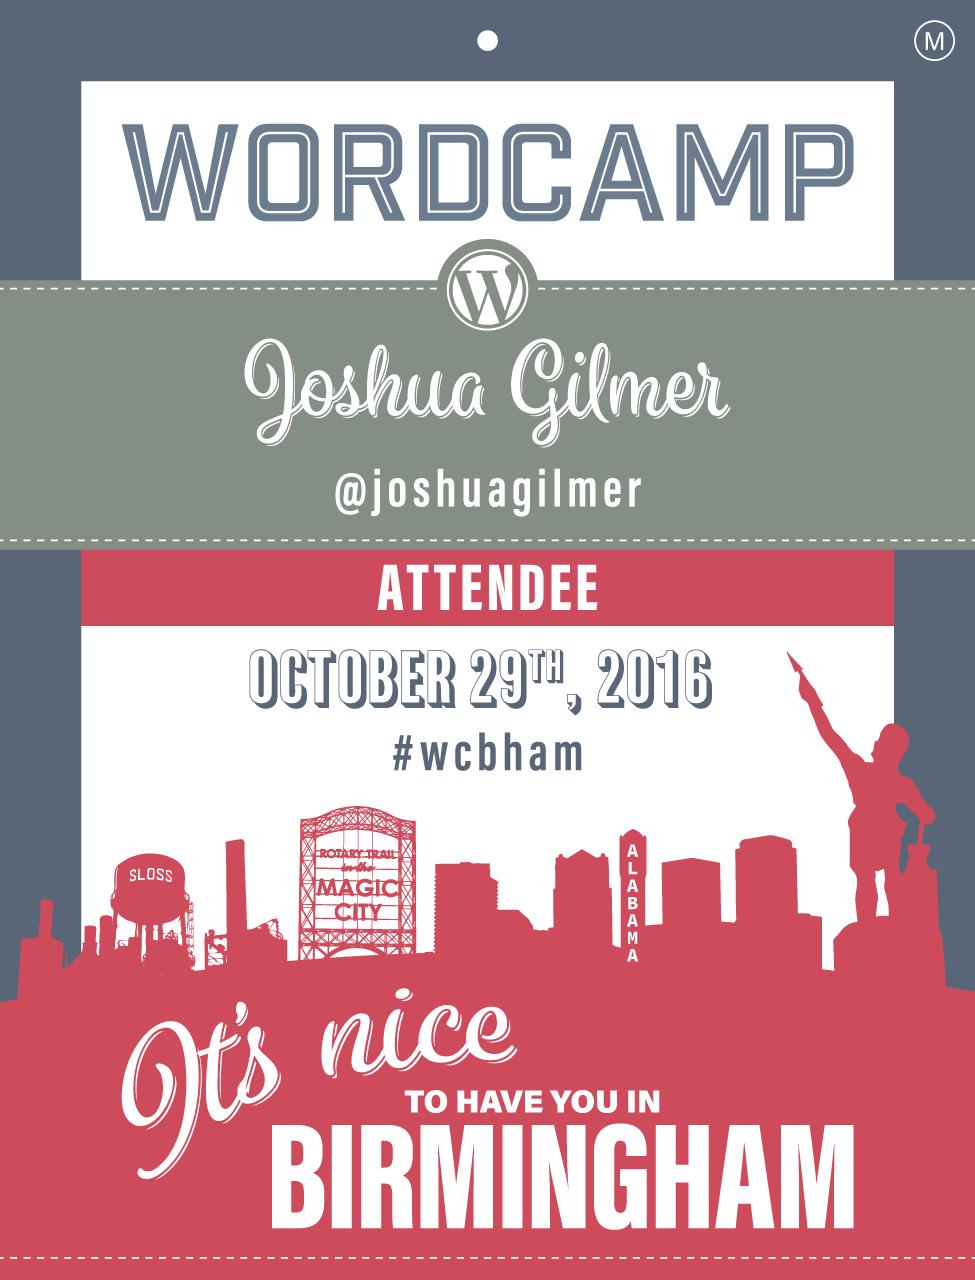 WordCamp Attendee Badge